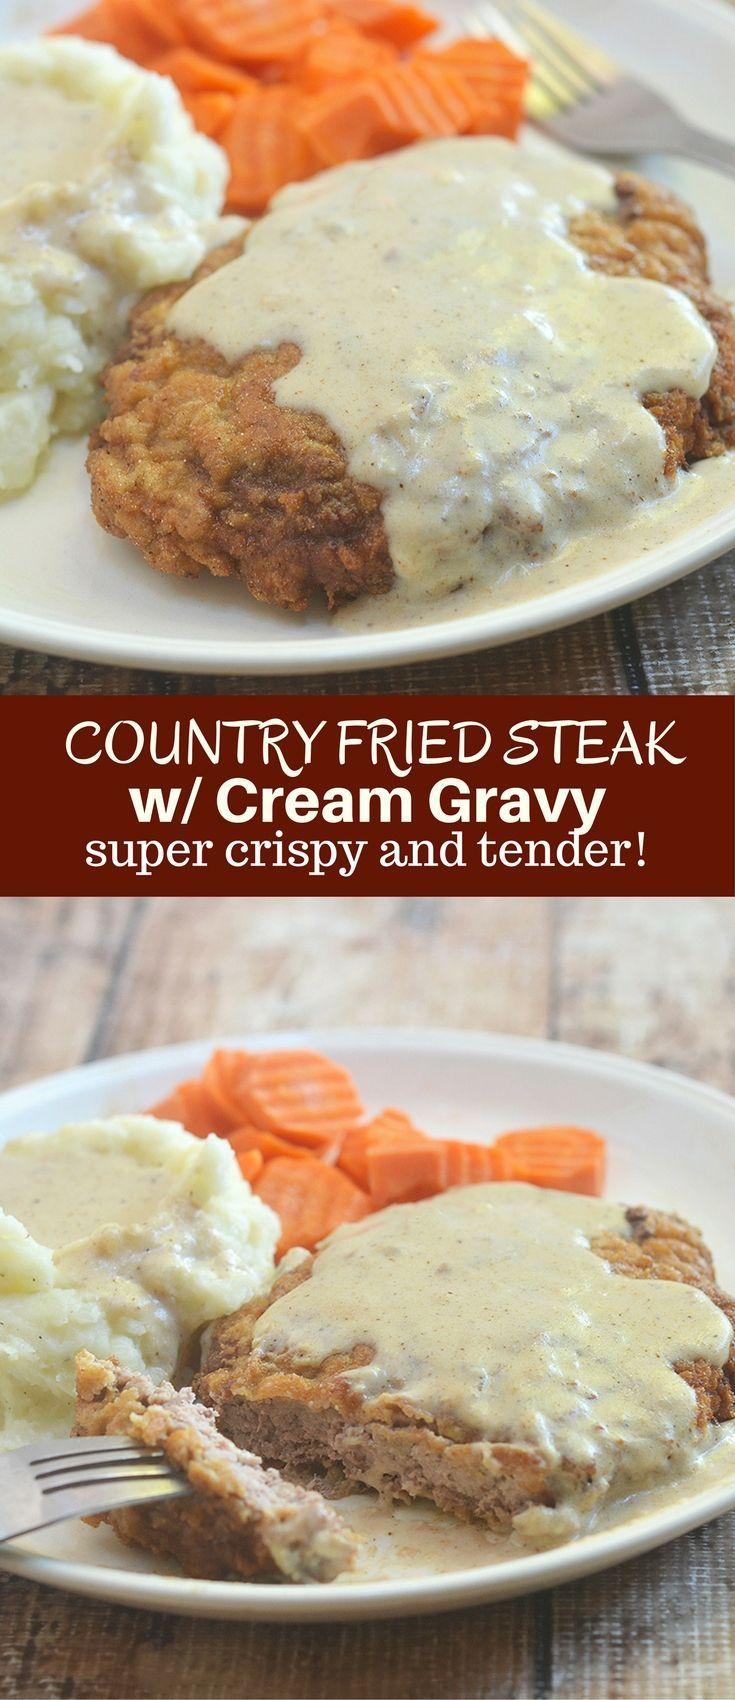 Country Fried Steak With Cream Gravy Recipe Country Fried Steak Grilled Steak Recipes Recipes